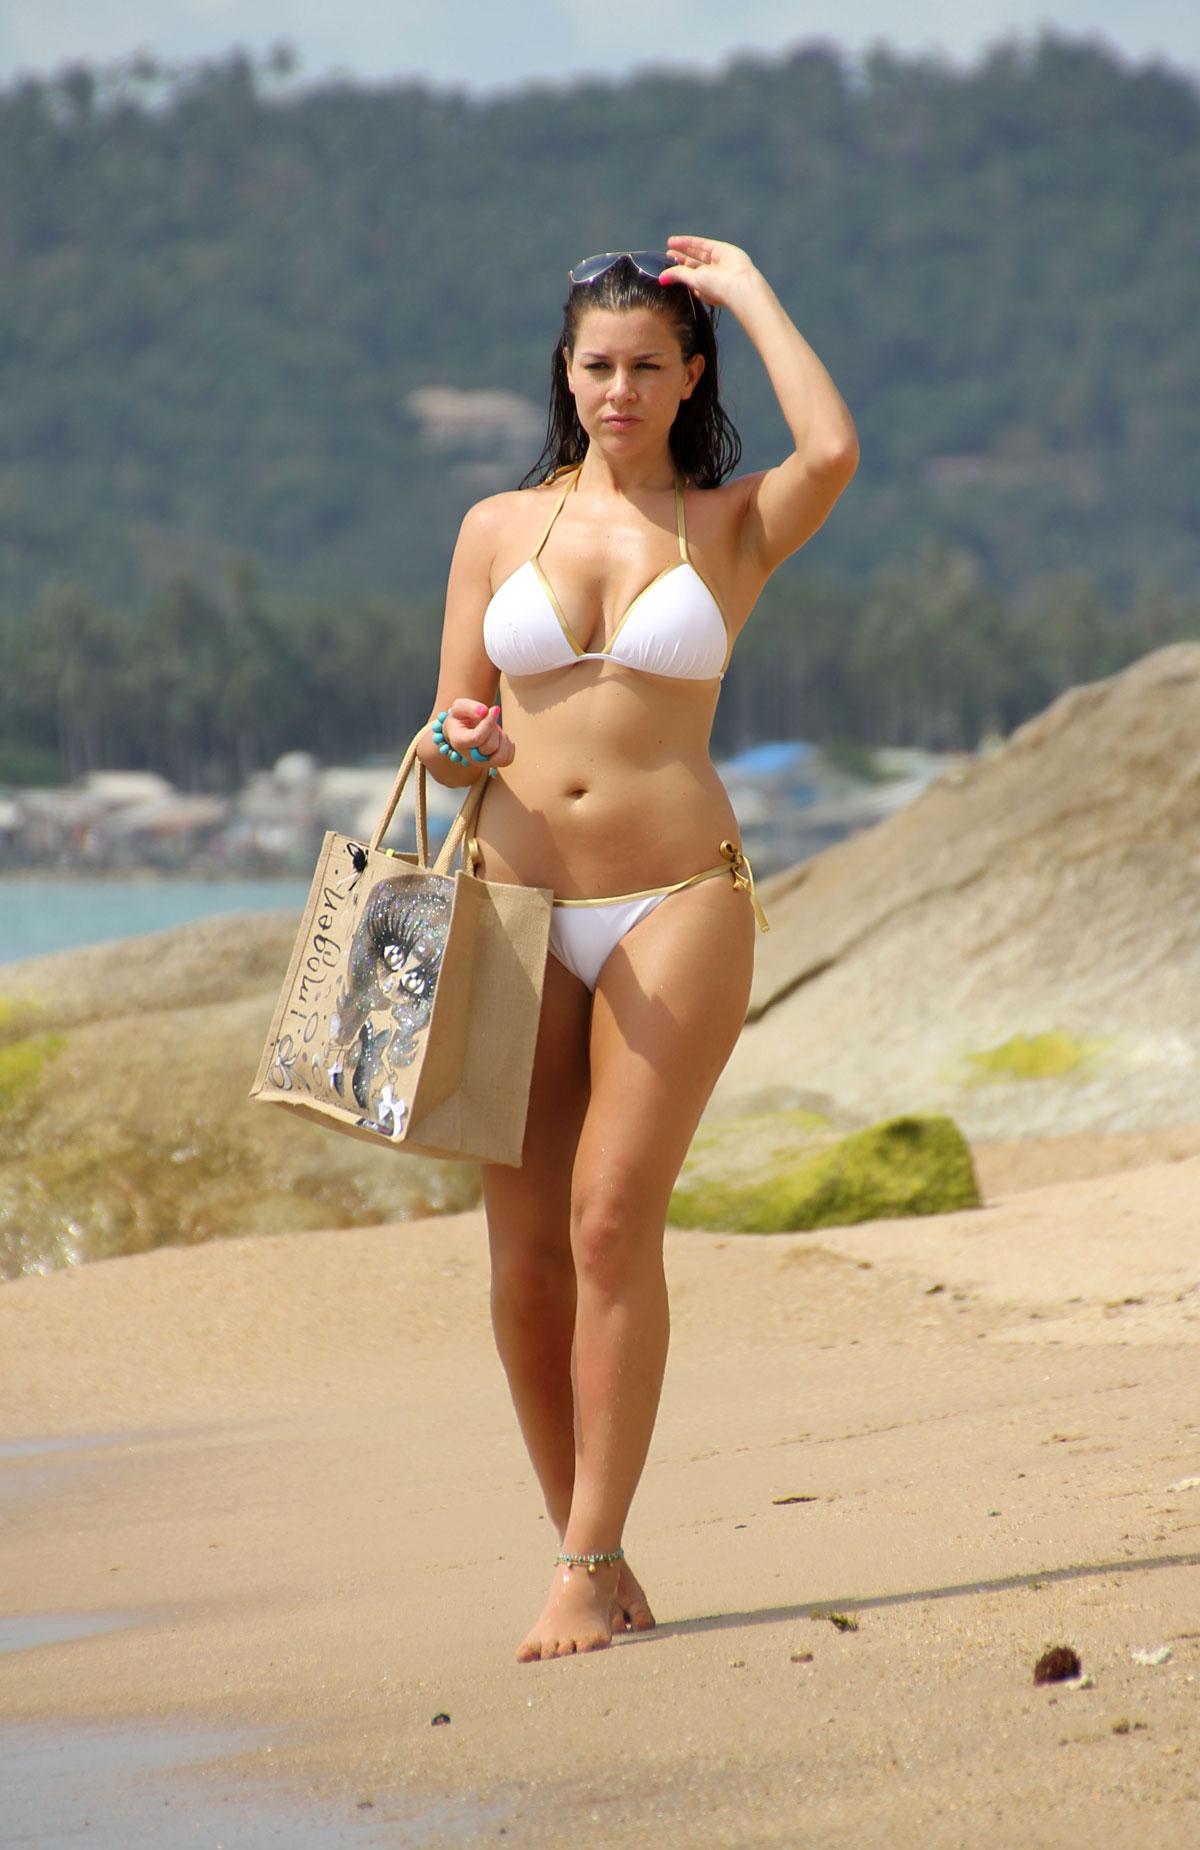 Celebrites Imogen Thomas nude (87 photos), Ass, Cleavage, Feet, bra 2020